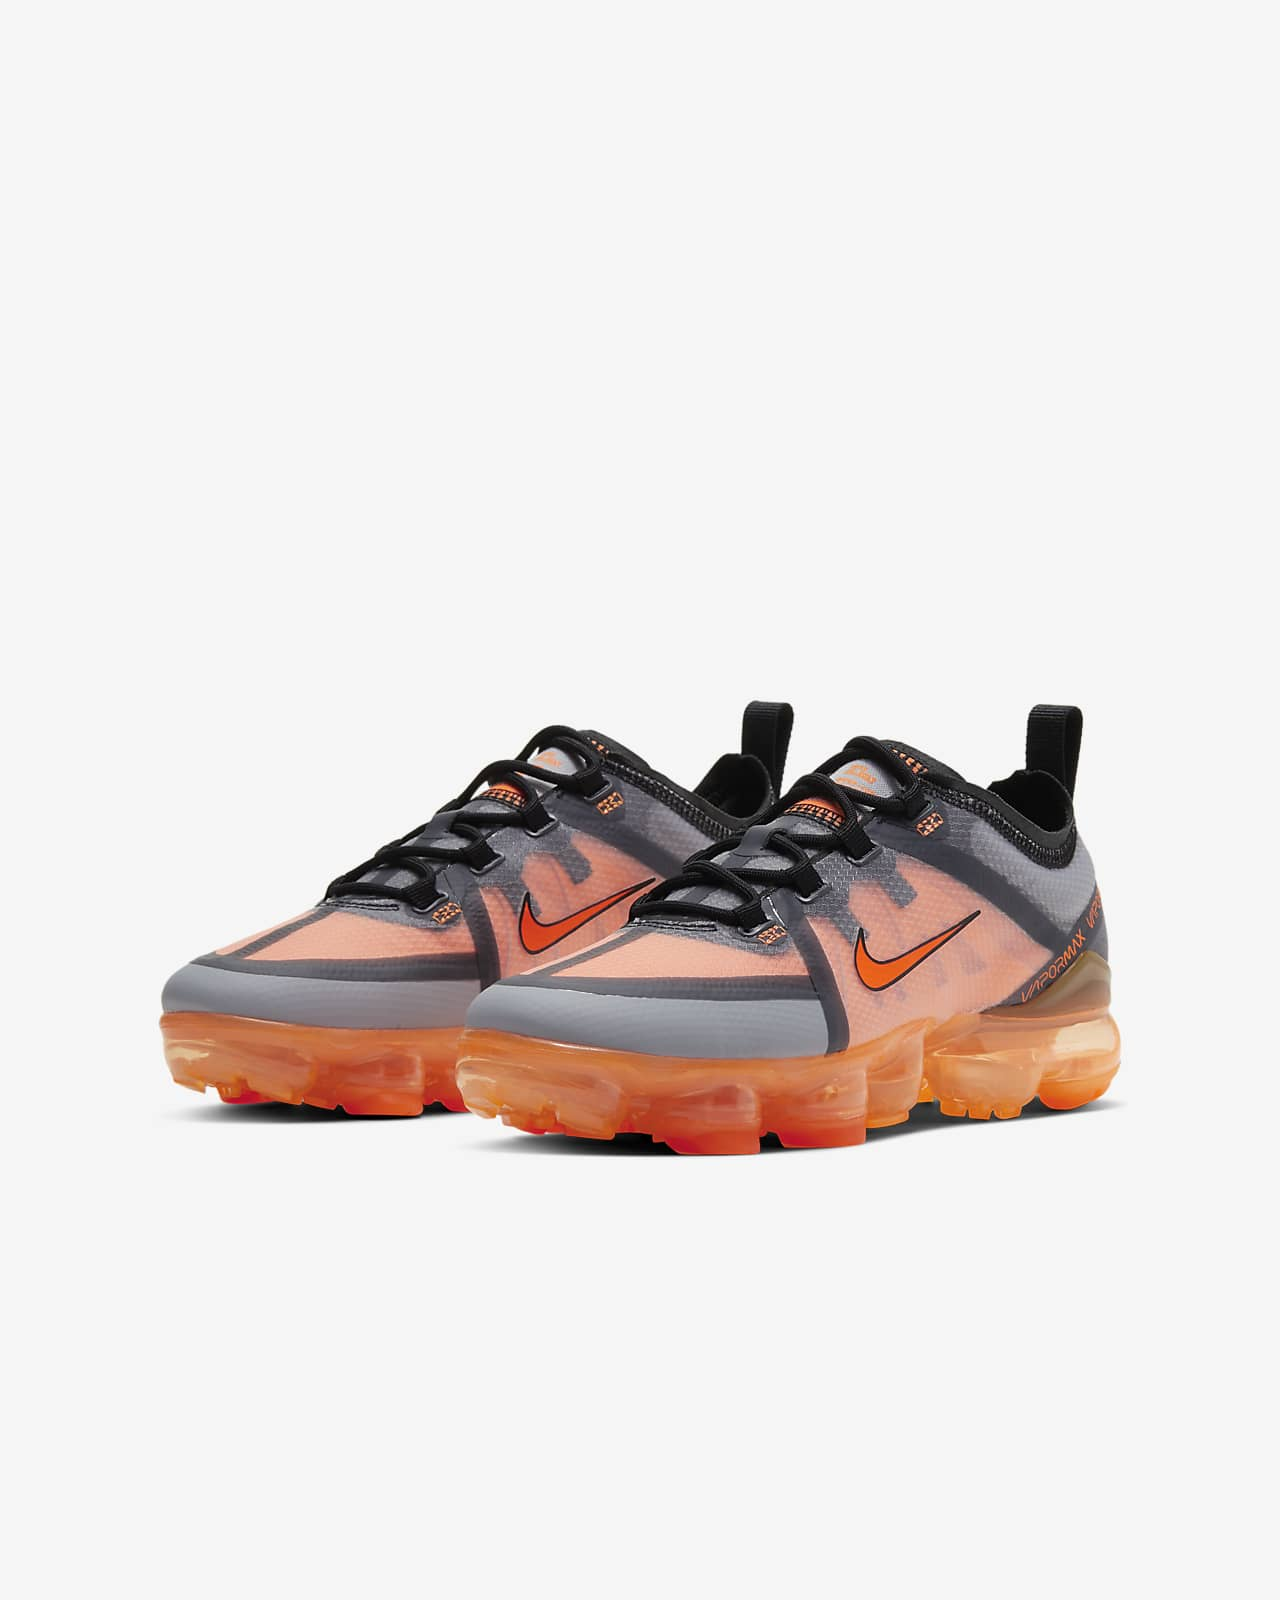 nike chaussure vapormax enfant